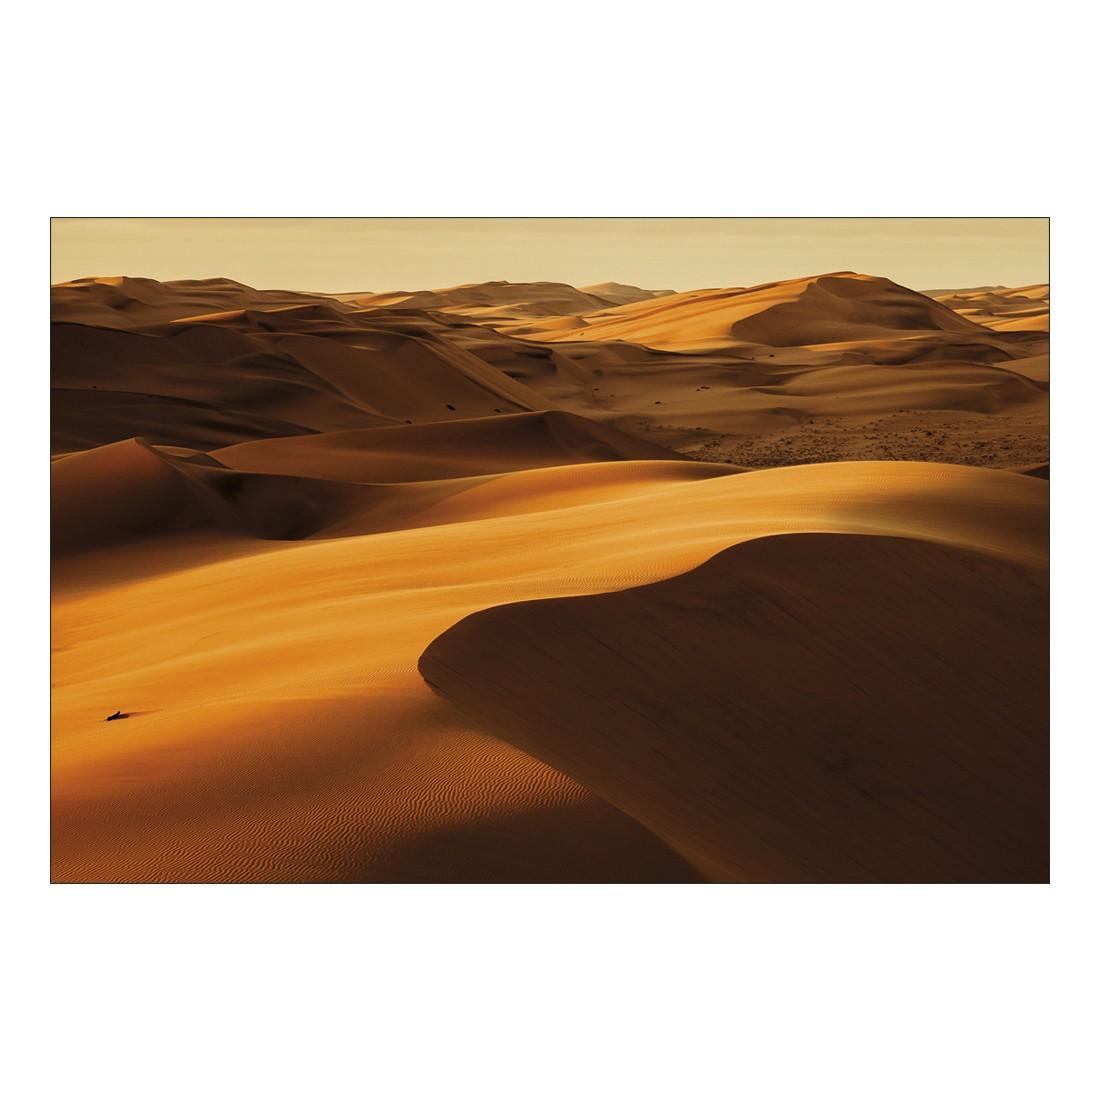 Acrylglasbild Sandy Desert – Abmessung 75×50 cm, Gallery of Innovative Art kaufen